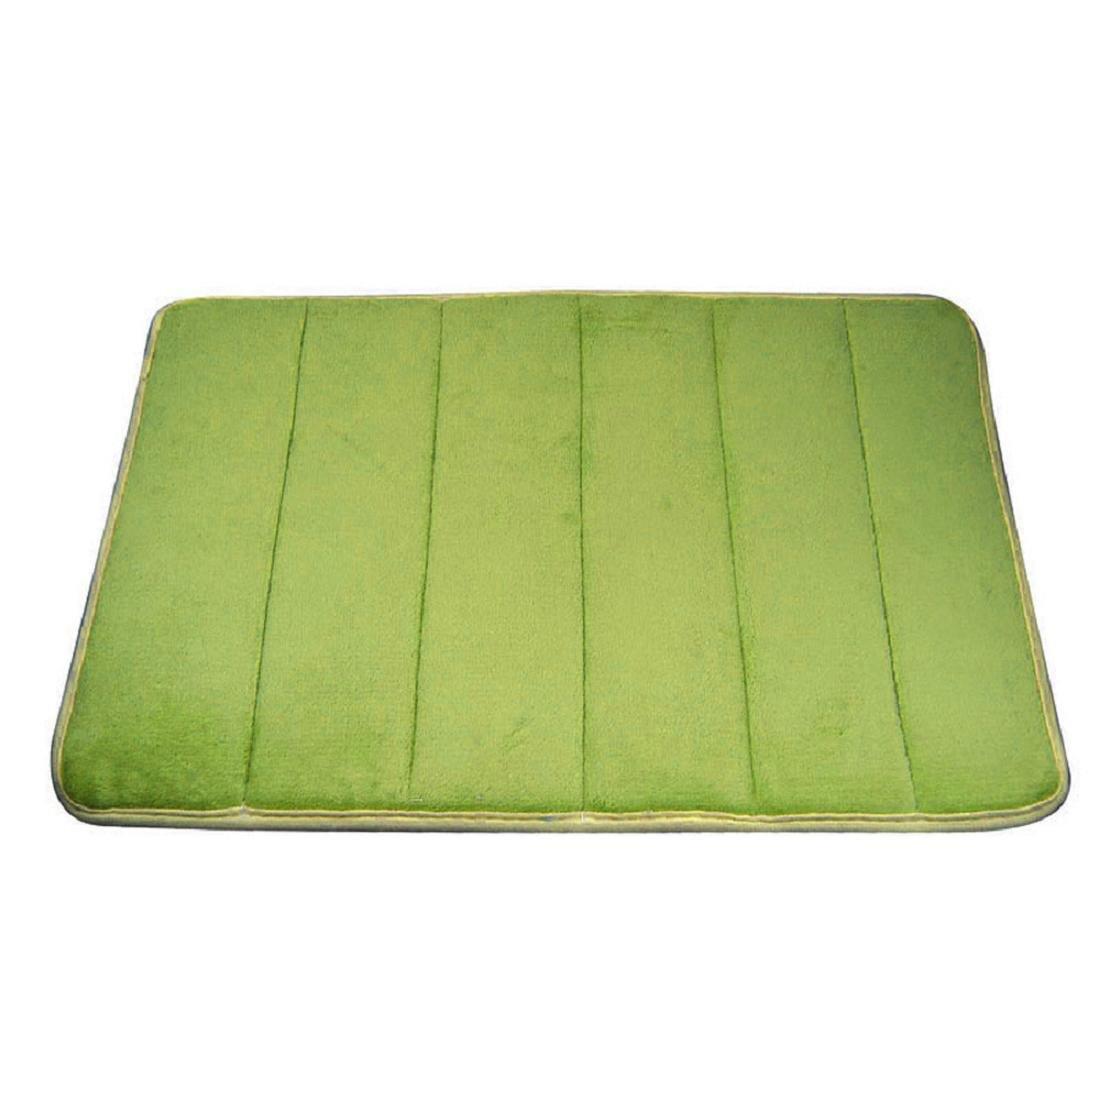 Coromose Rugs Vertical Stripes Memory Foam Bath Mat Carpet Floor Mats (Green)